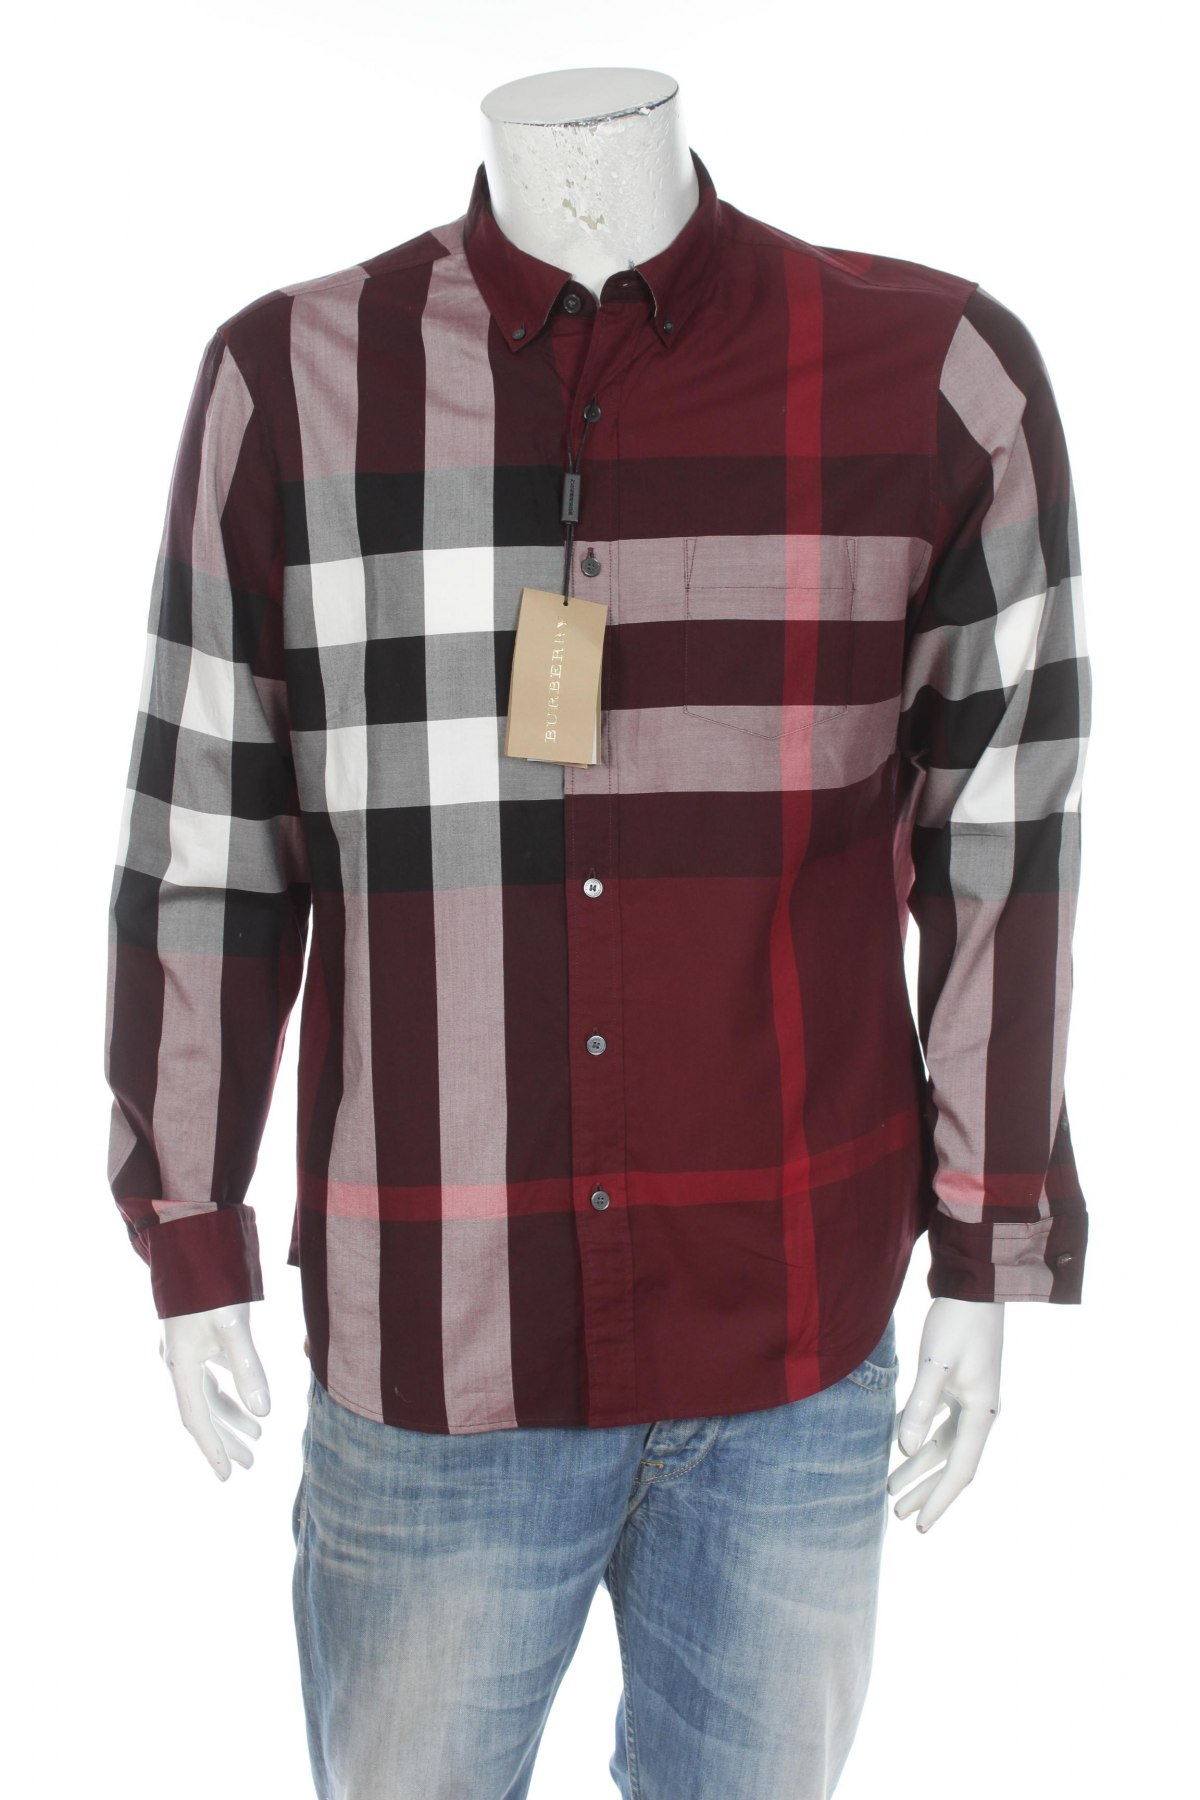 b75bece3d592 Ανδρικό πουκάμισο Burberry - σε συμφέρουσα τιμή στο Remix -  100027127